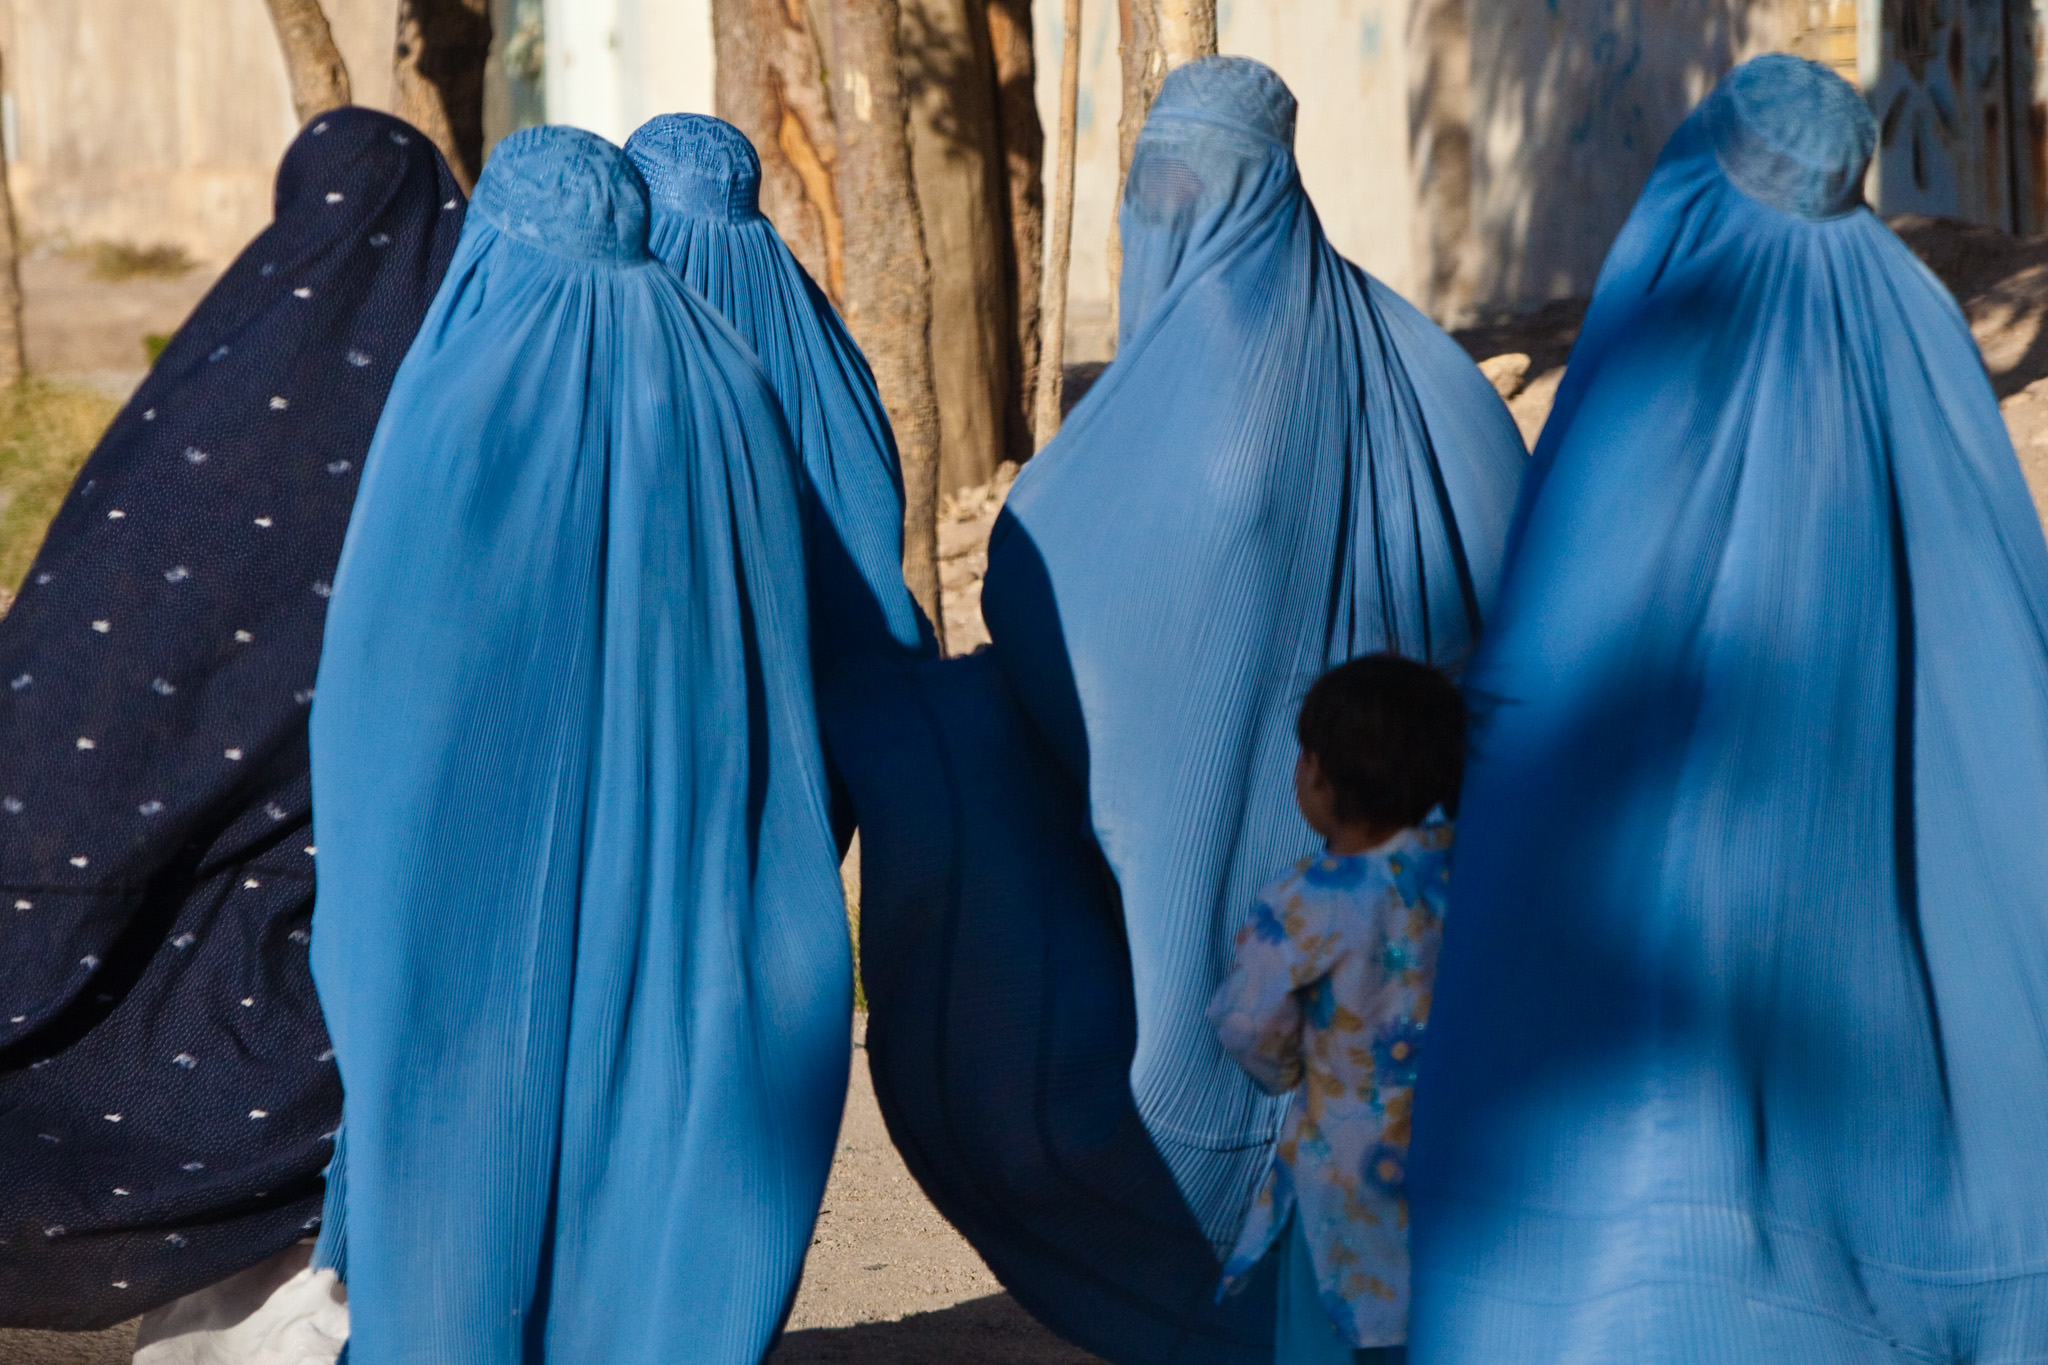 Austria Bans Full-Face Burqas, Will Fine Women Who Wear Them Featured